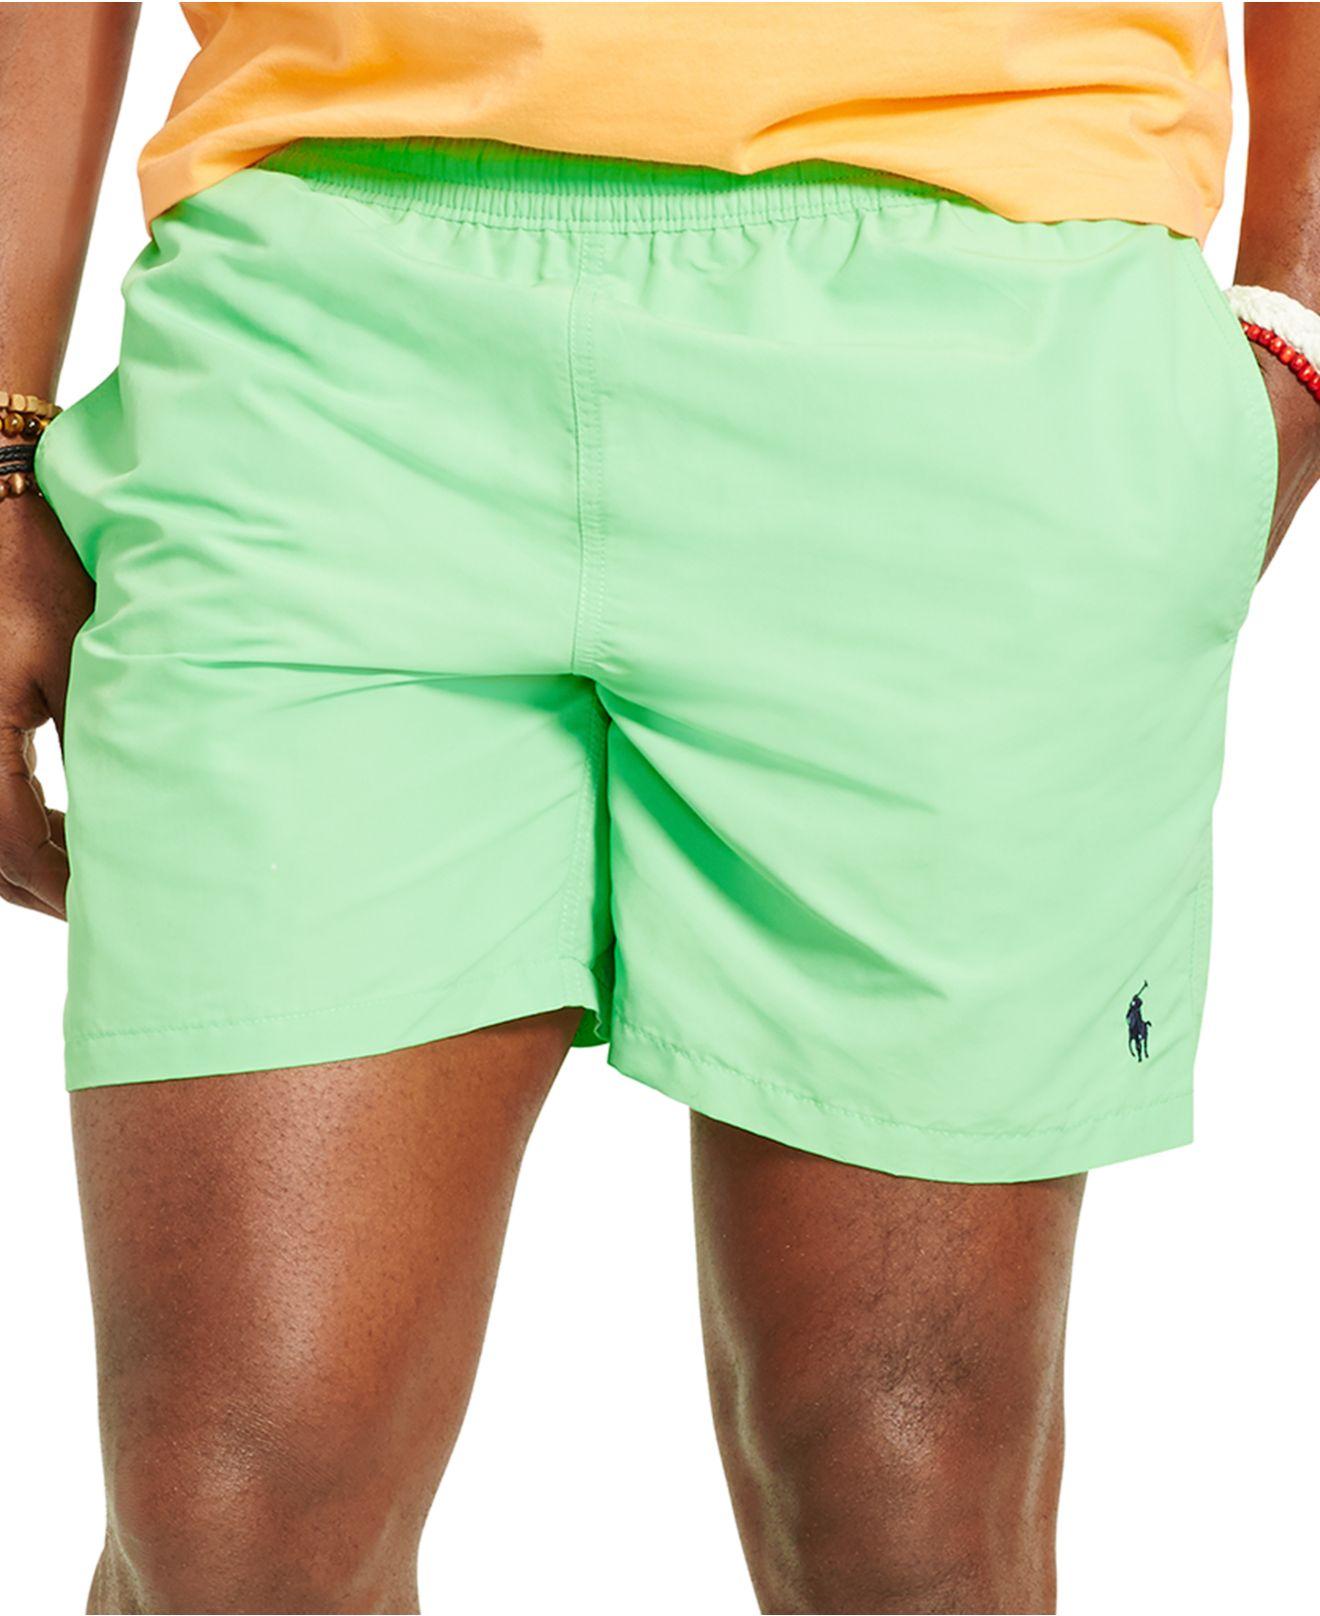 72ada7a78ad77 Polo Ralph Lauren Big & Tall Hawaiian Swim Trunks in Green for Men ...